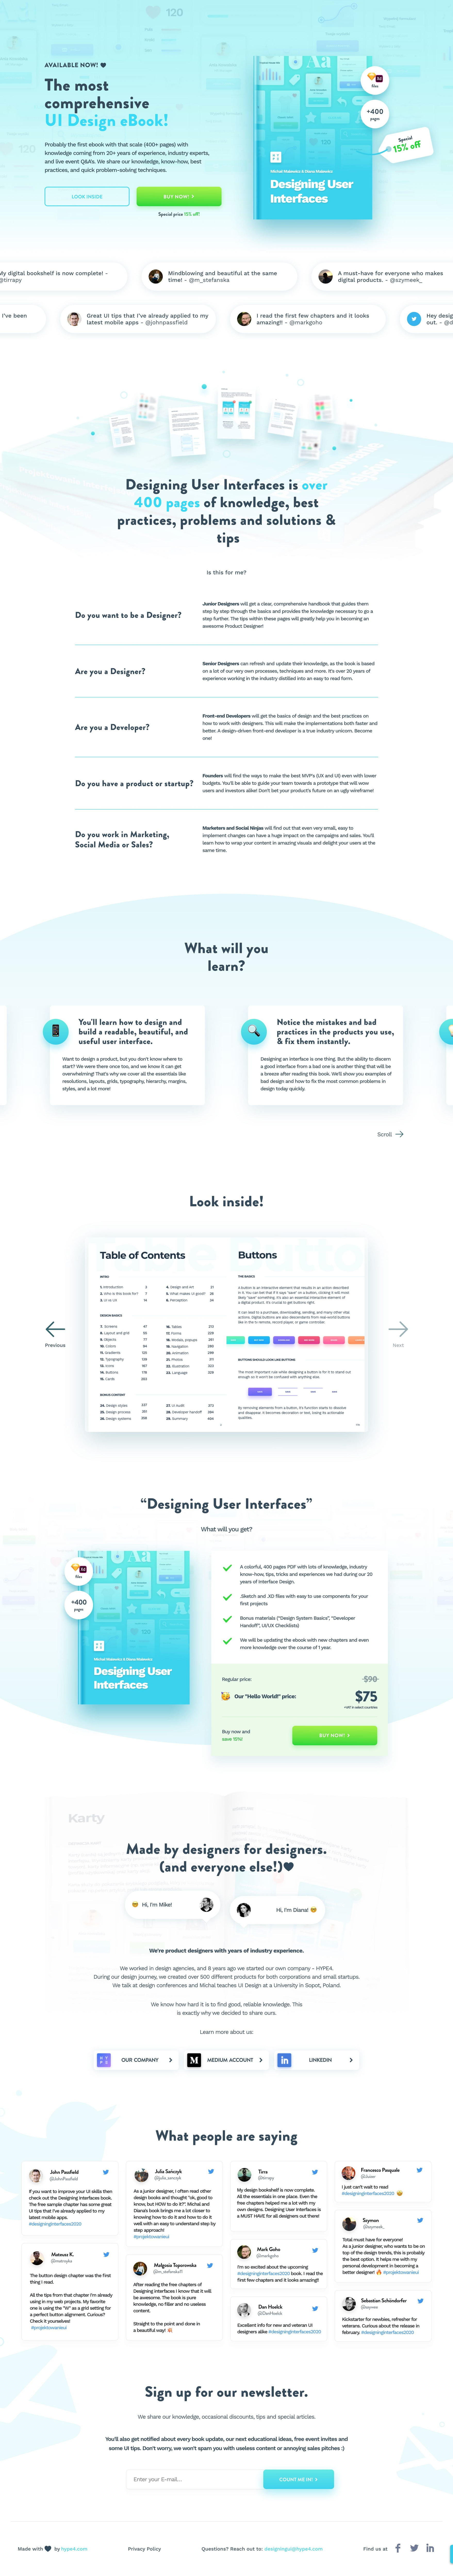 Designing User Interfaces Website Screenshot